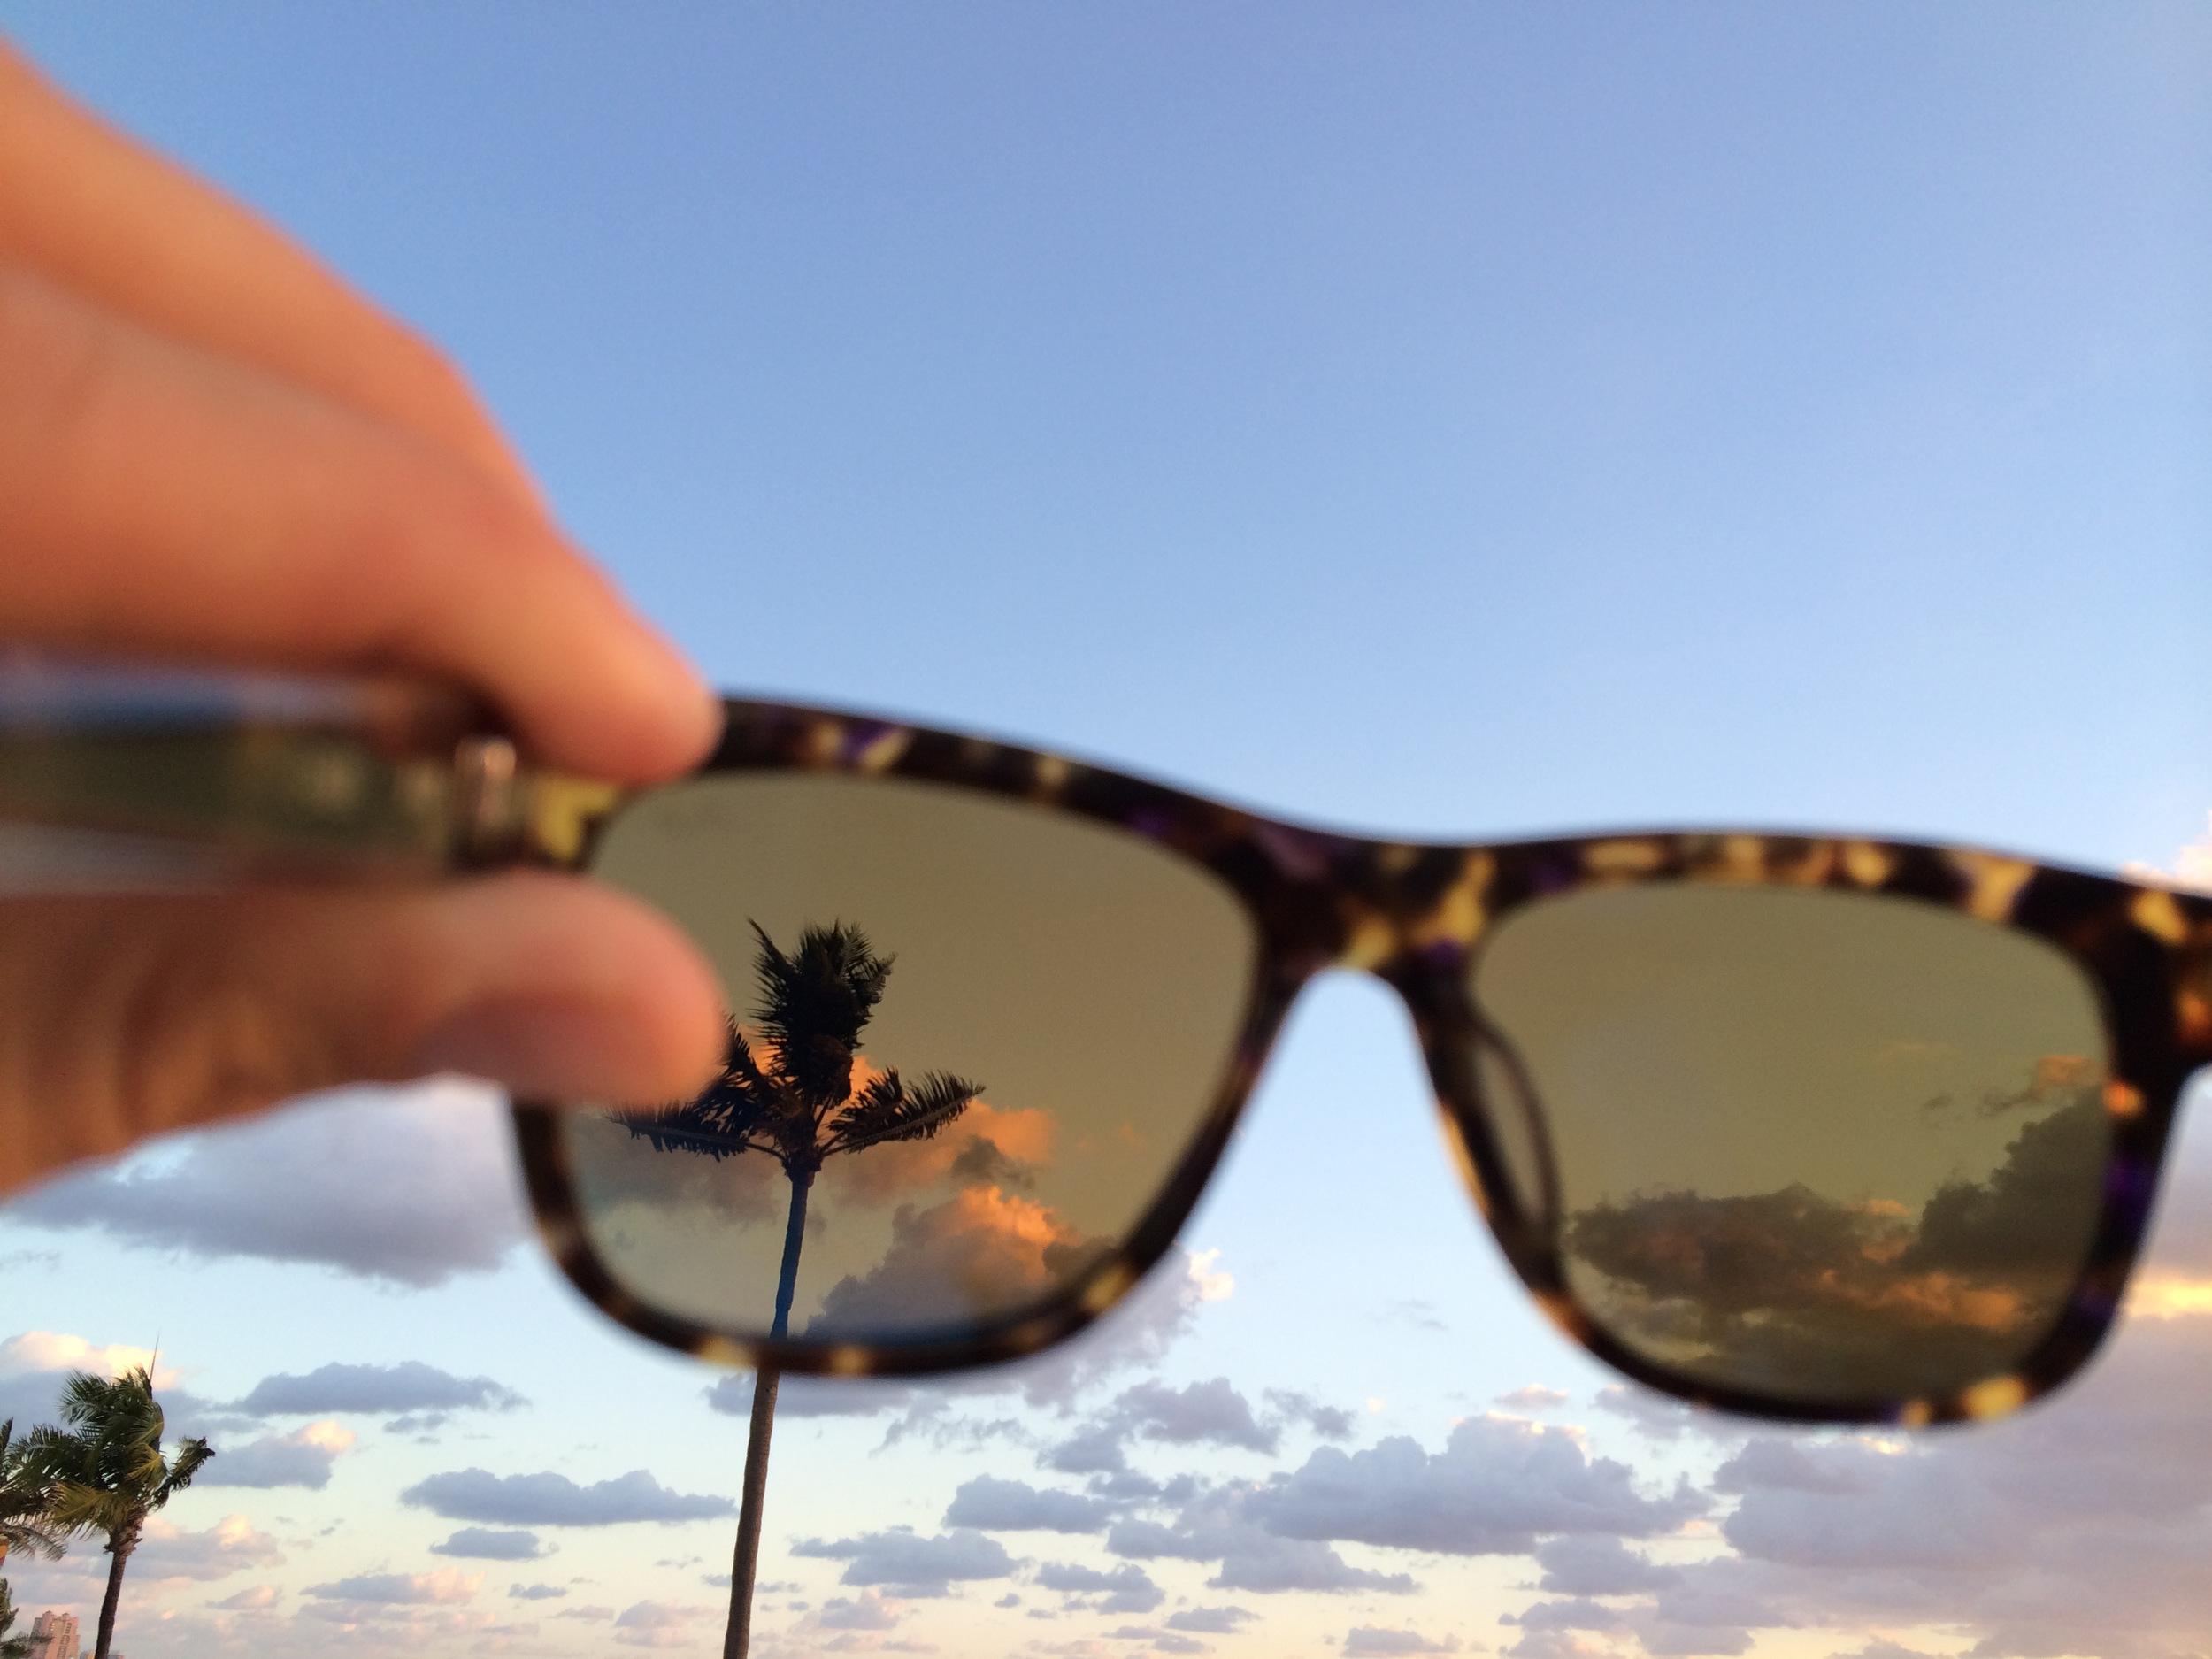 Palms and sky.